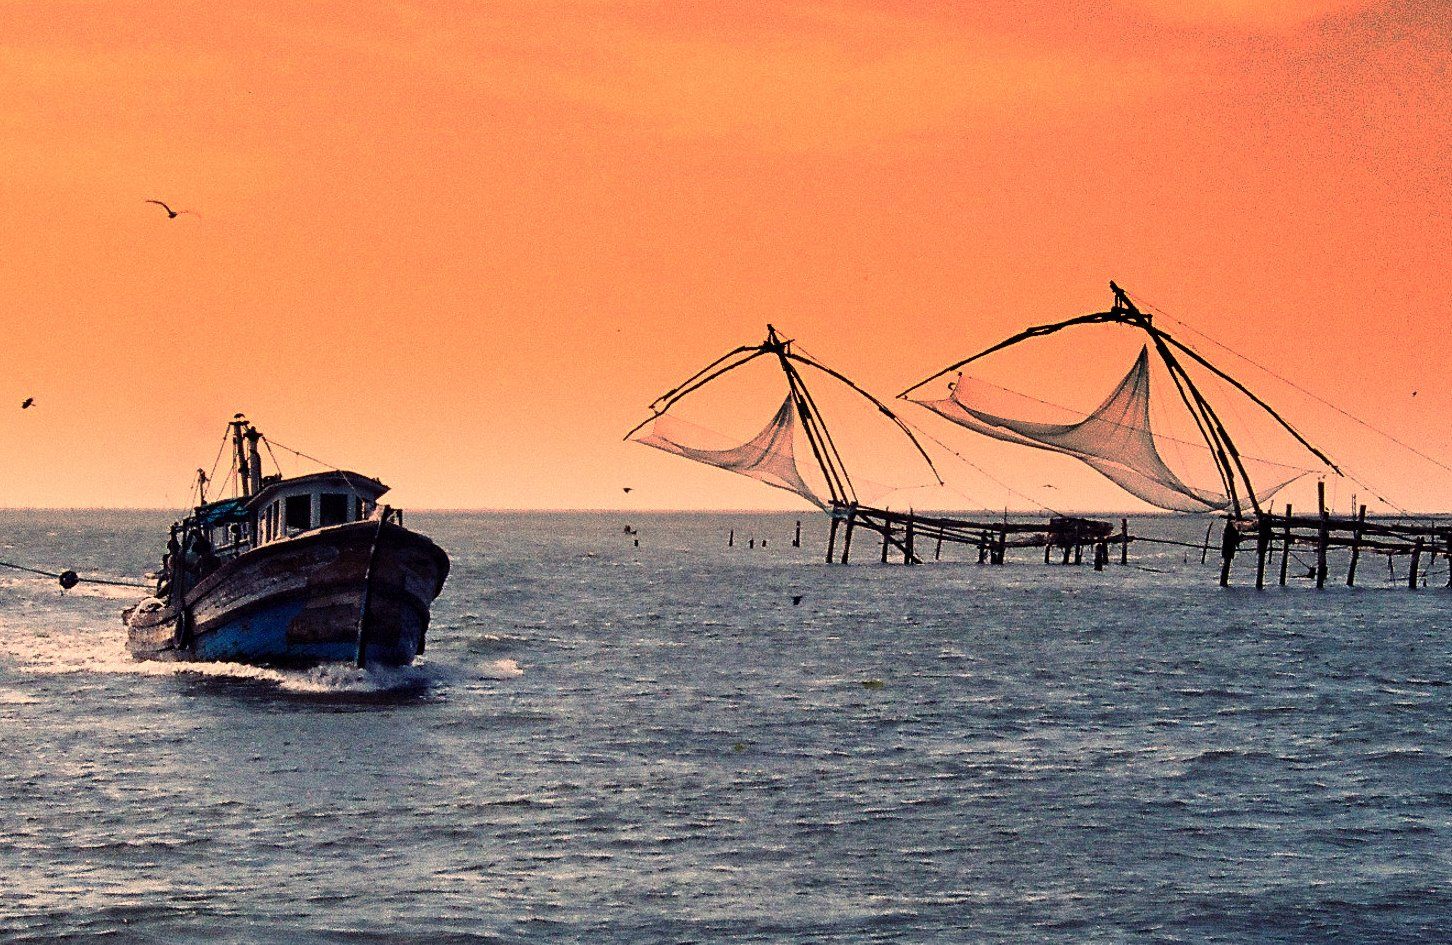 Jours 1 : Arriver a Cochin